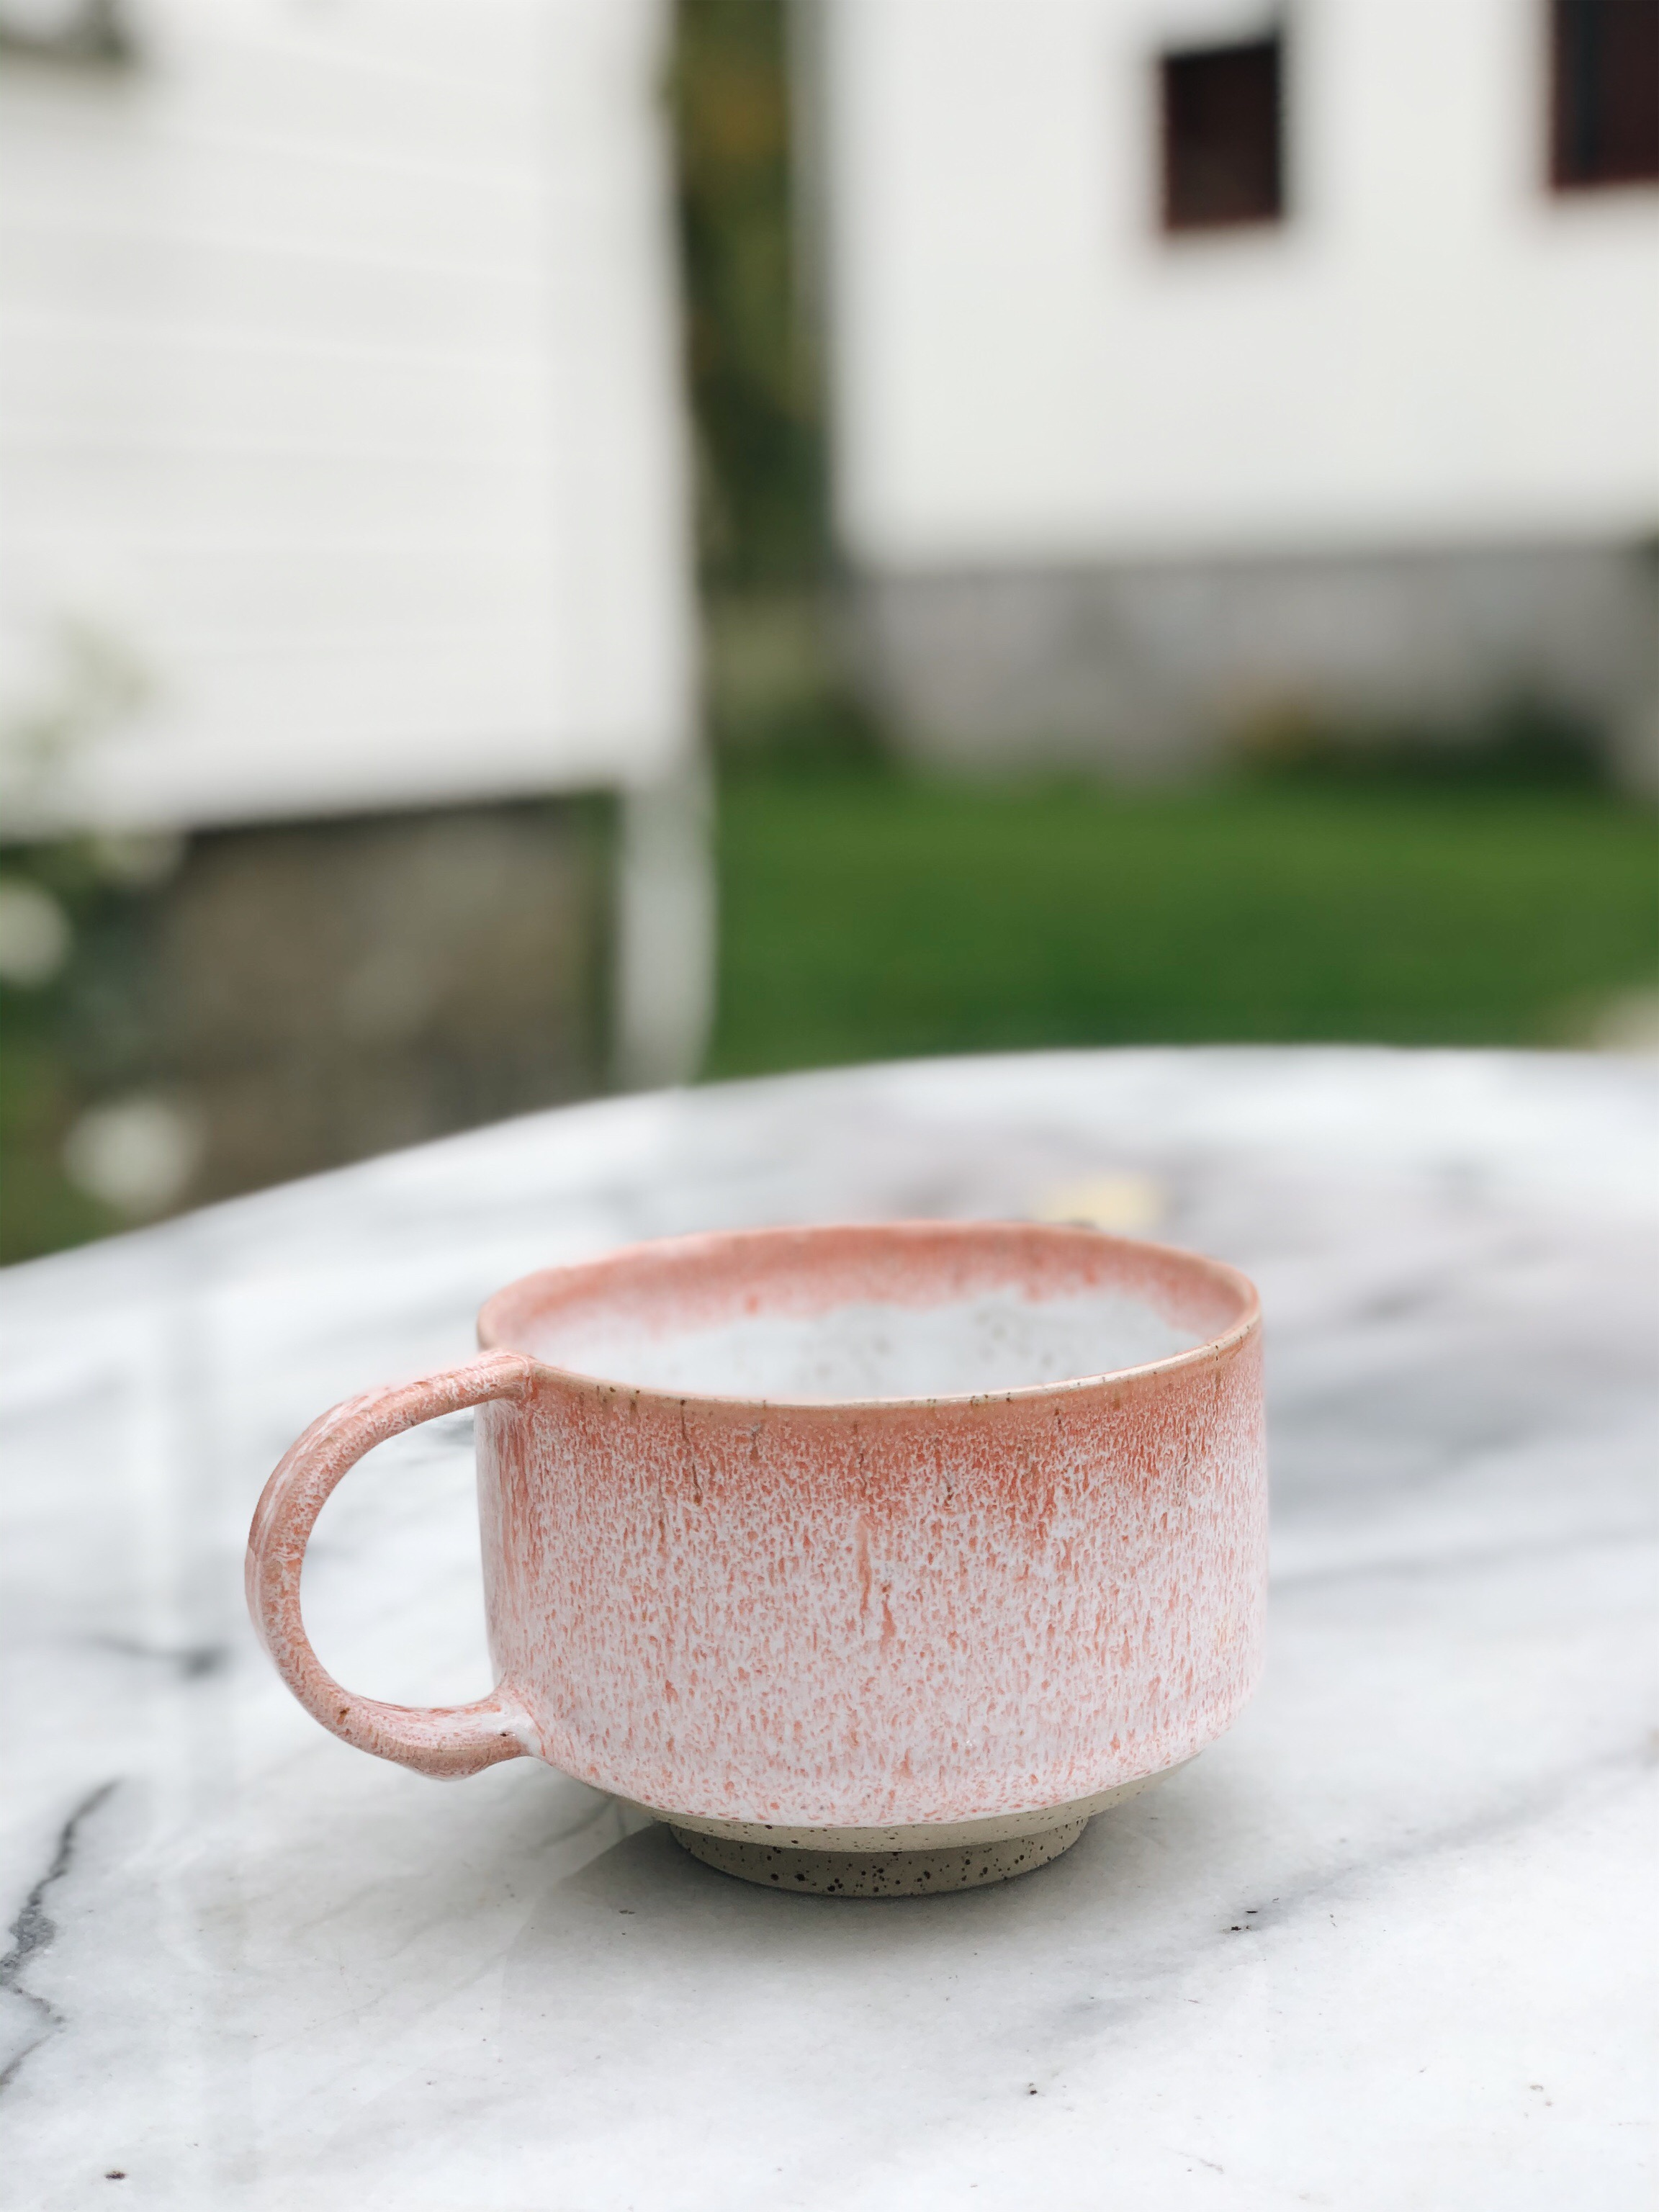 STUDIO ARHØJ - Mion Mug, Buttermilk pink